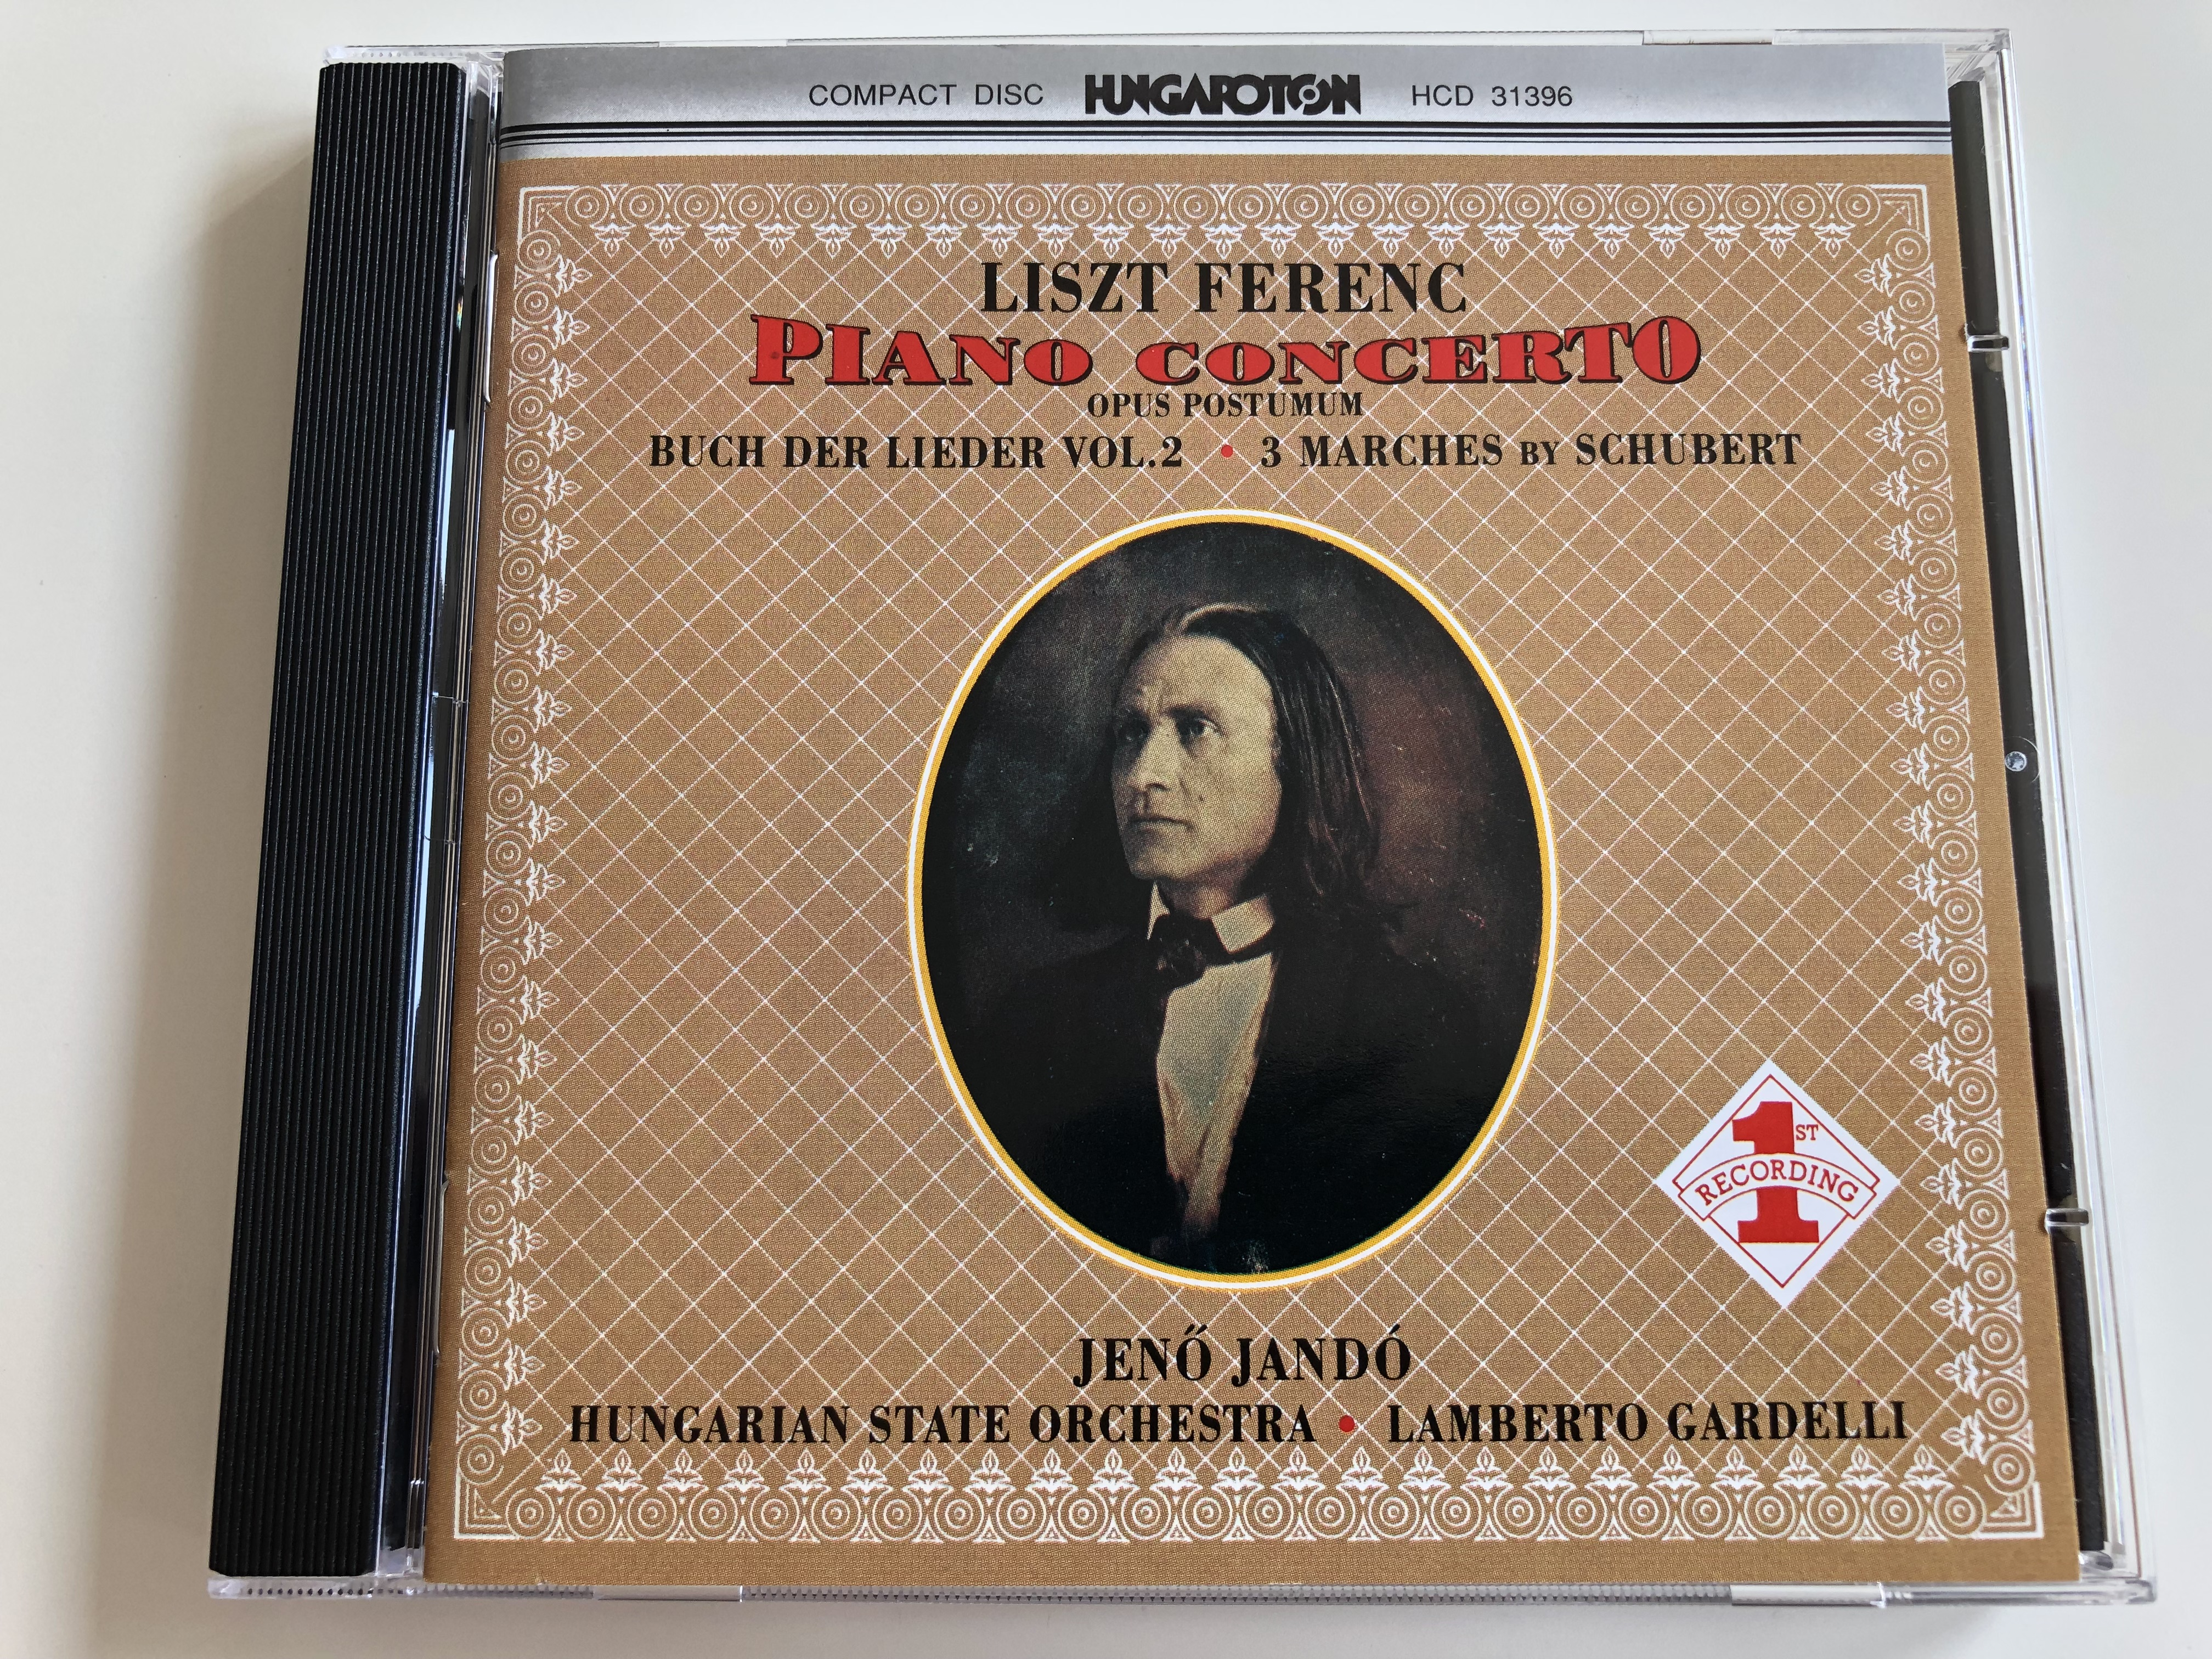 liszt-ferenc-piano-concerto-opus-postumum-buch-der-lieder-vol-2.-3-marches-by-schubert-hungarian-state-orchestra-1-.jpg